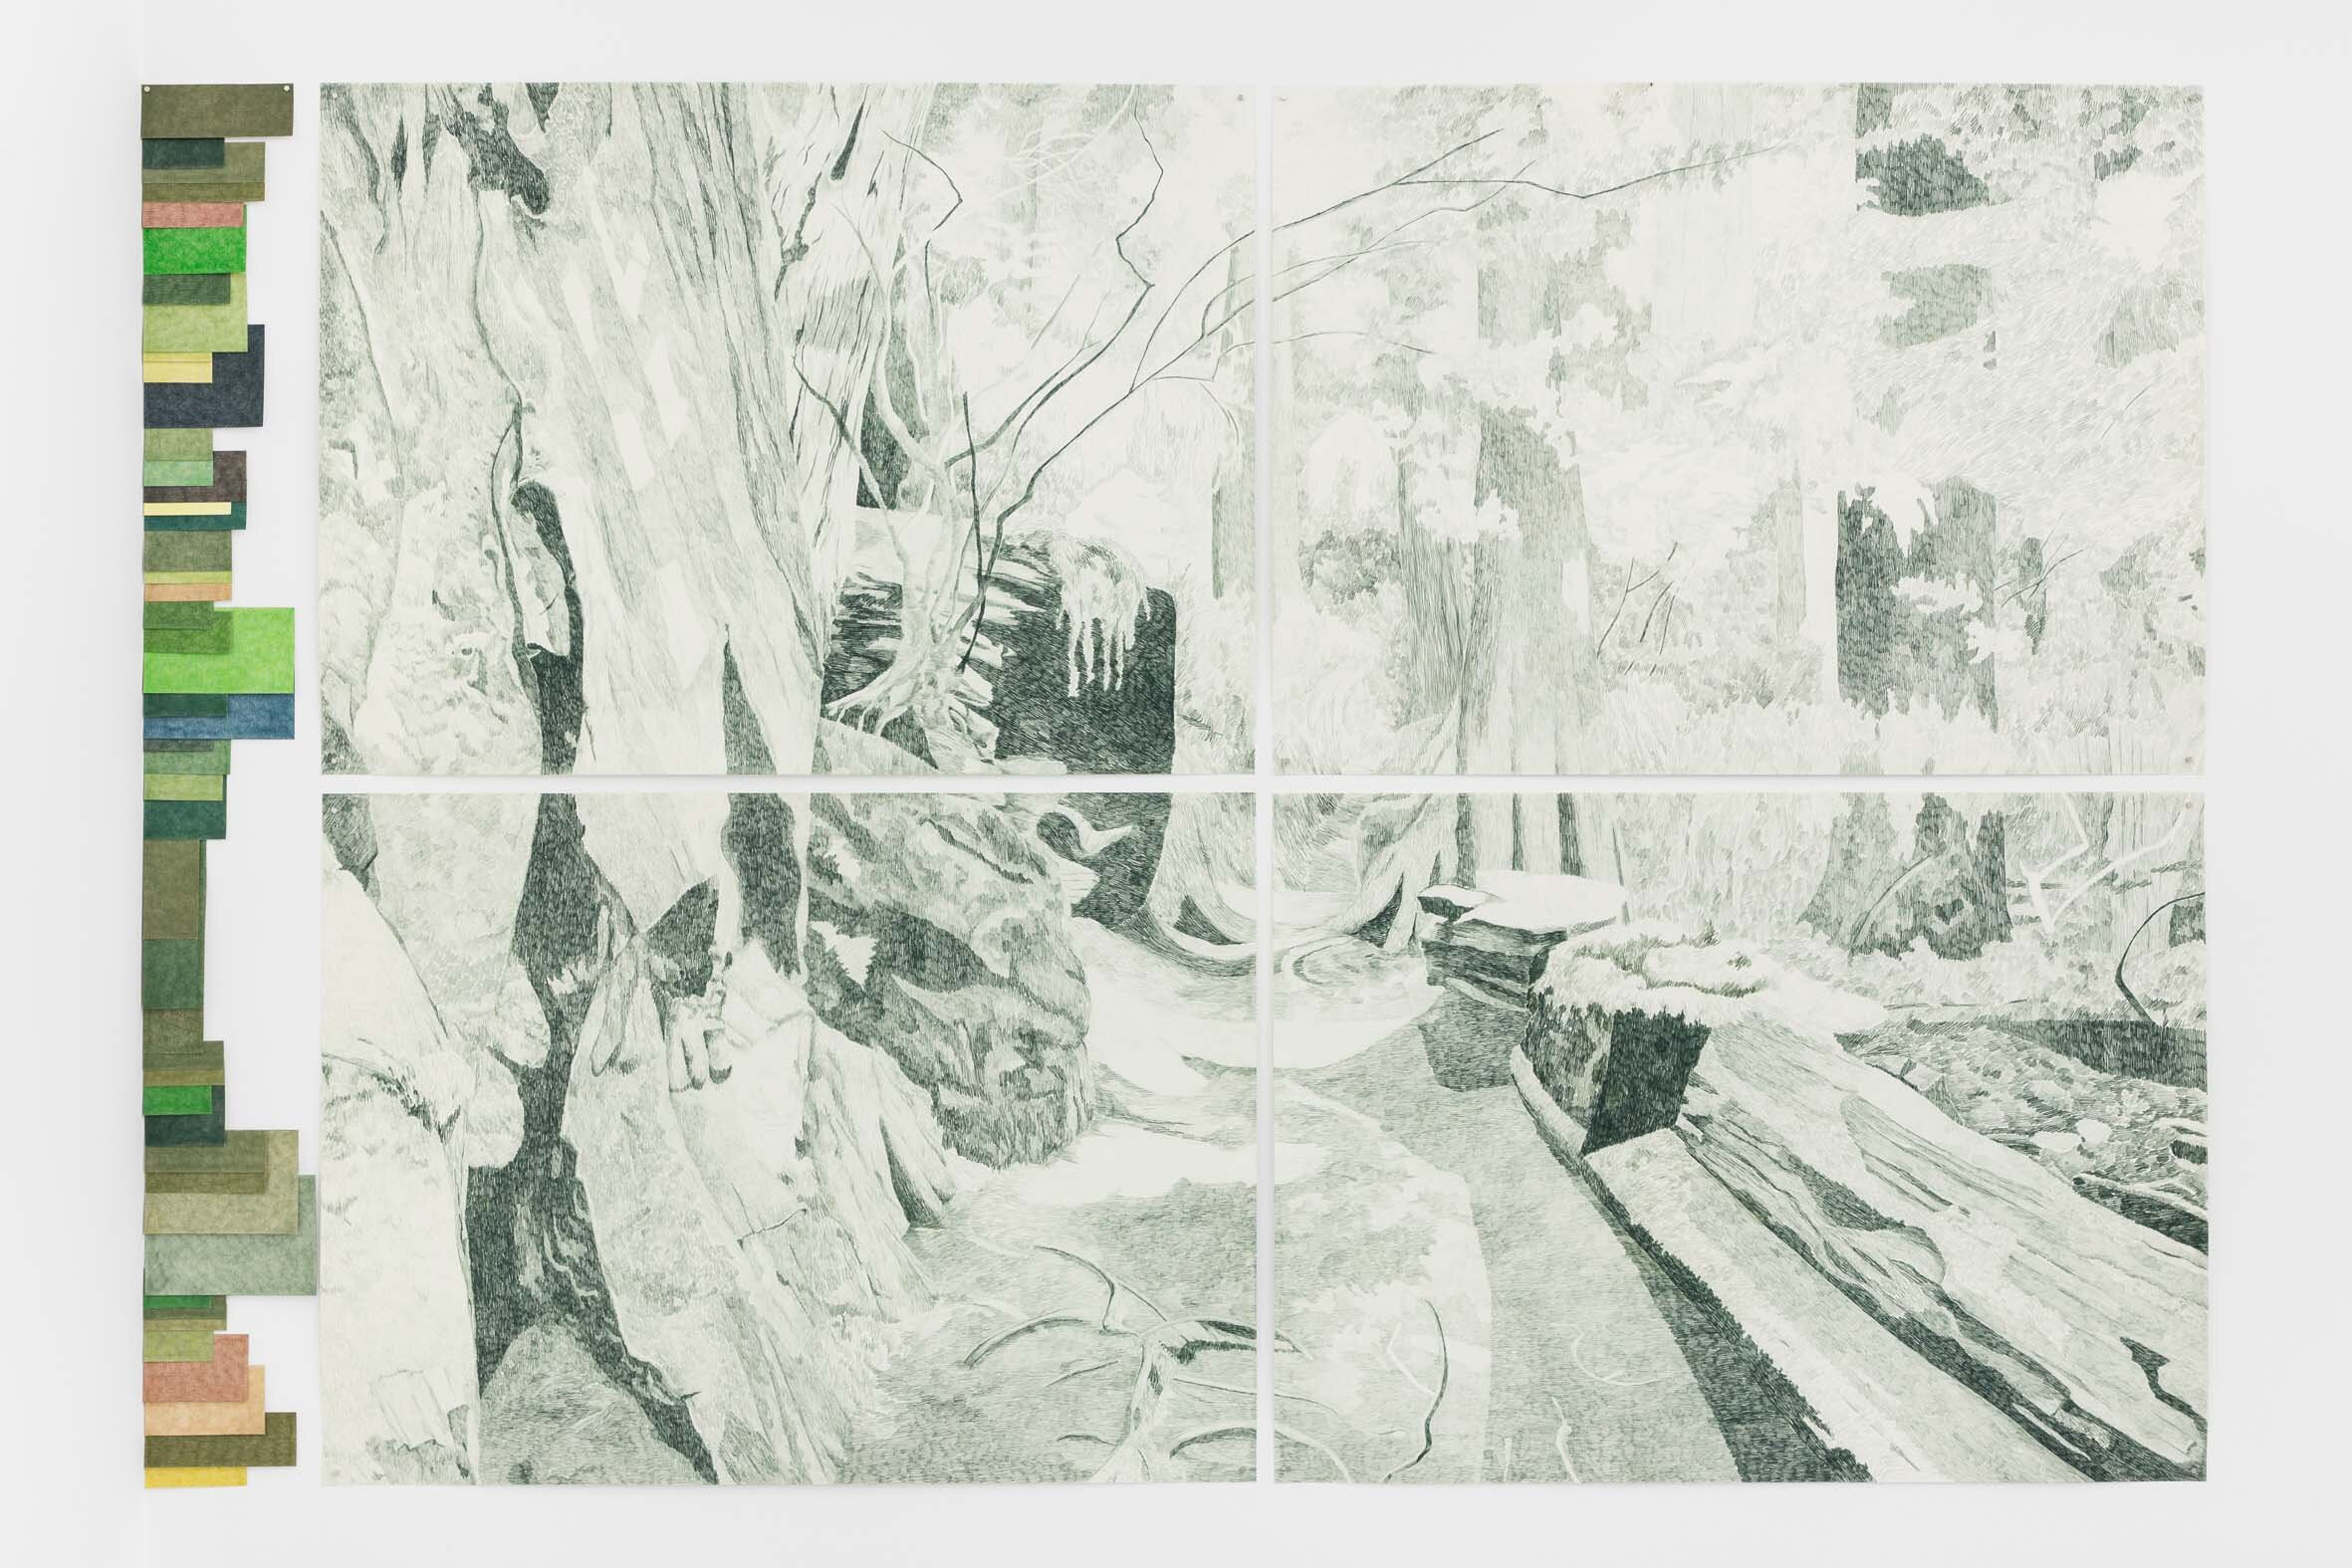 Landscape in Relair #1.jpg